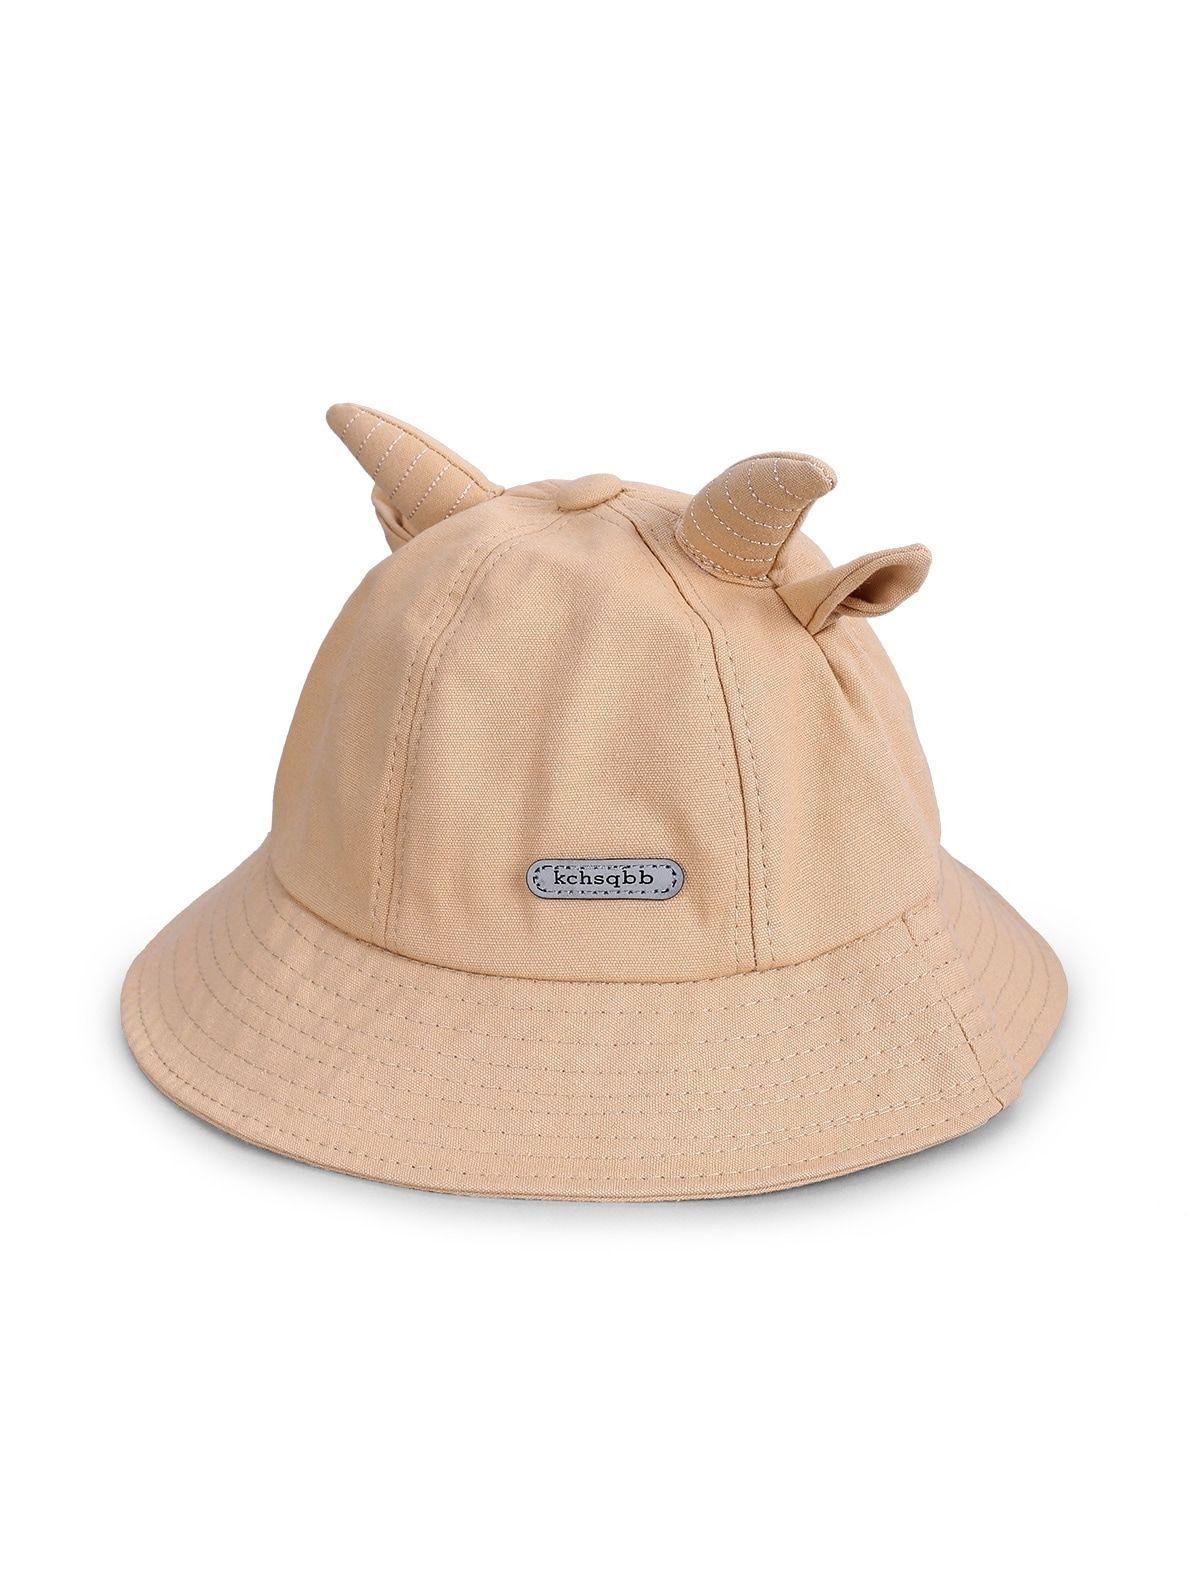 Cute Animal Ear Bucket Hats Black Light Khaki Tangerine Yellow Bucket Hat Black Animal Ears Hats